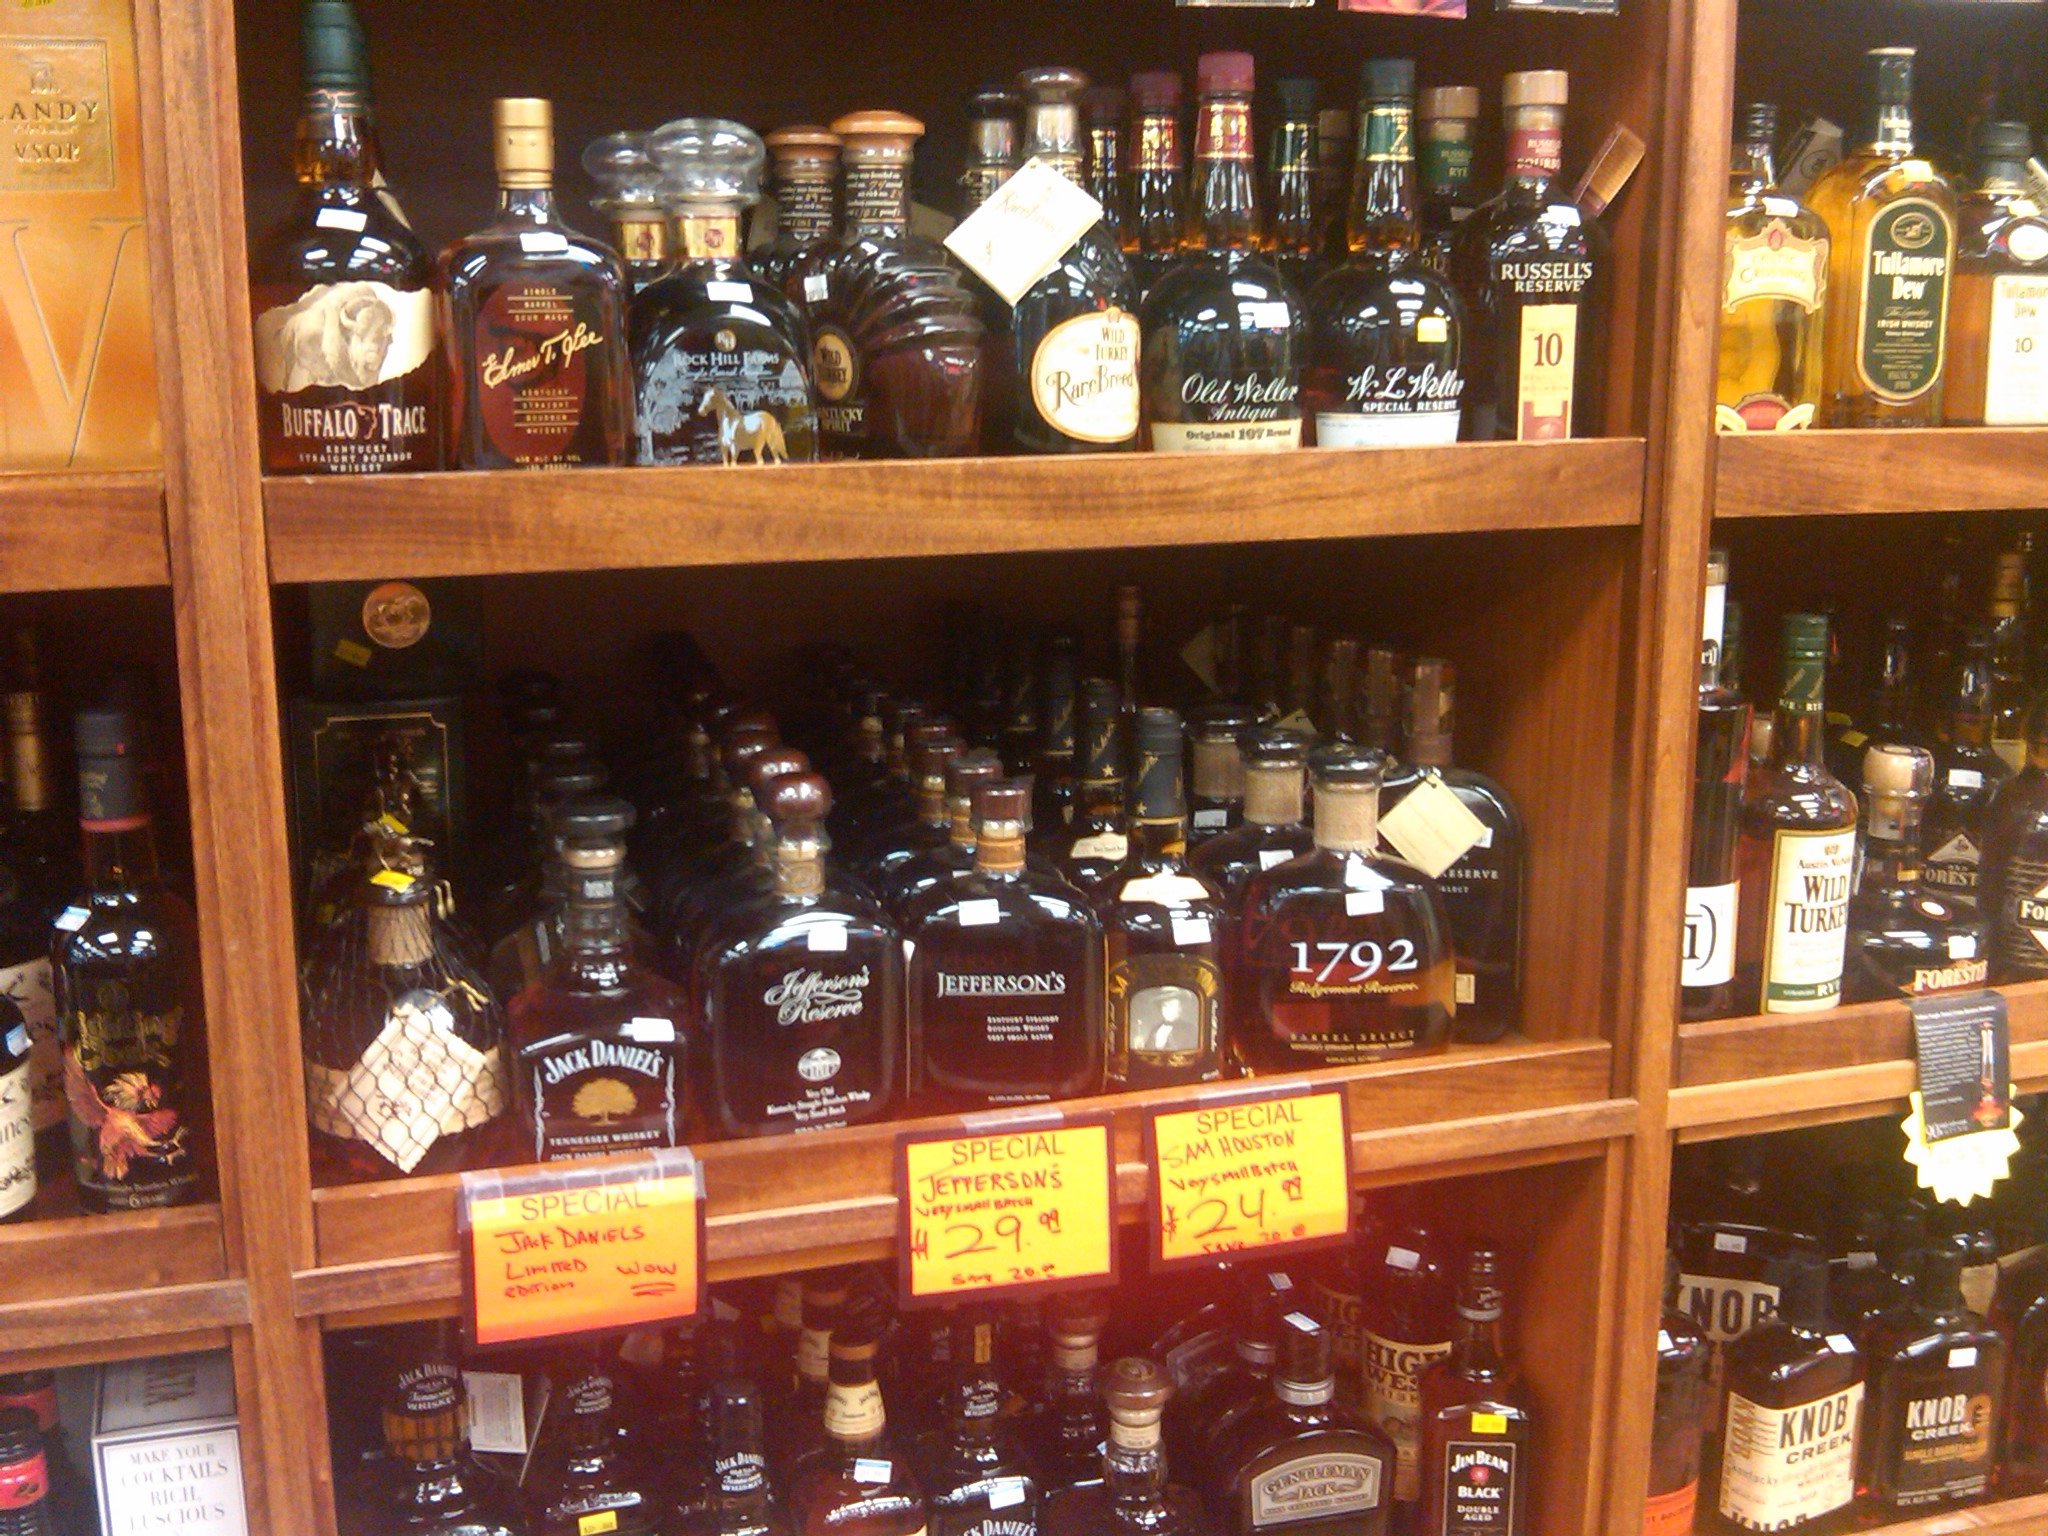 Bill s coronado whiskey and cigar blog where to buy cigars and